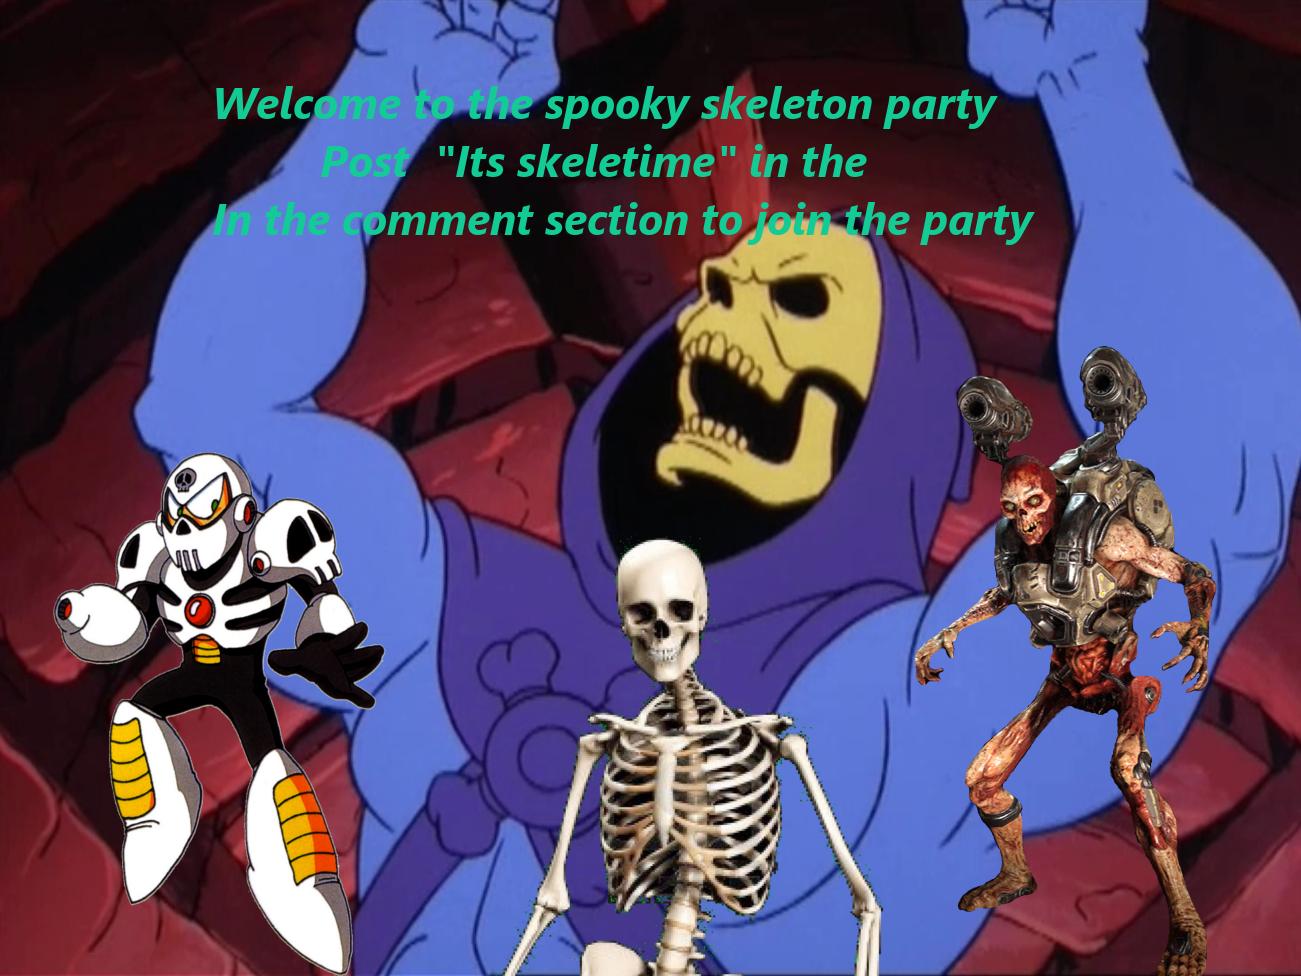 Gif Exit Skeleton Yes Skeletor Meme Wwwmiifotoscom